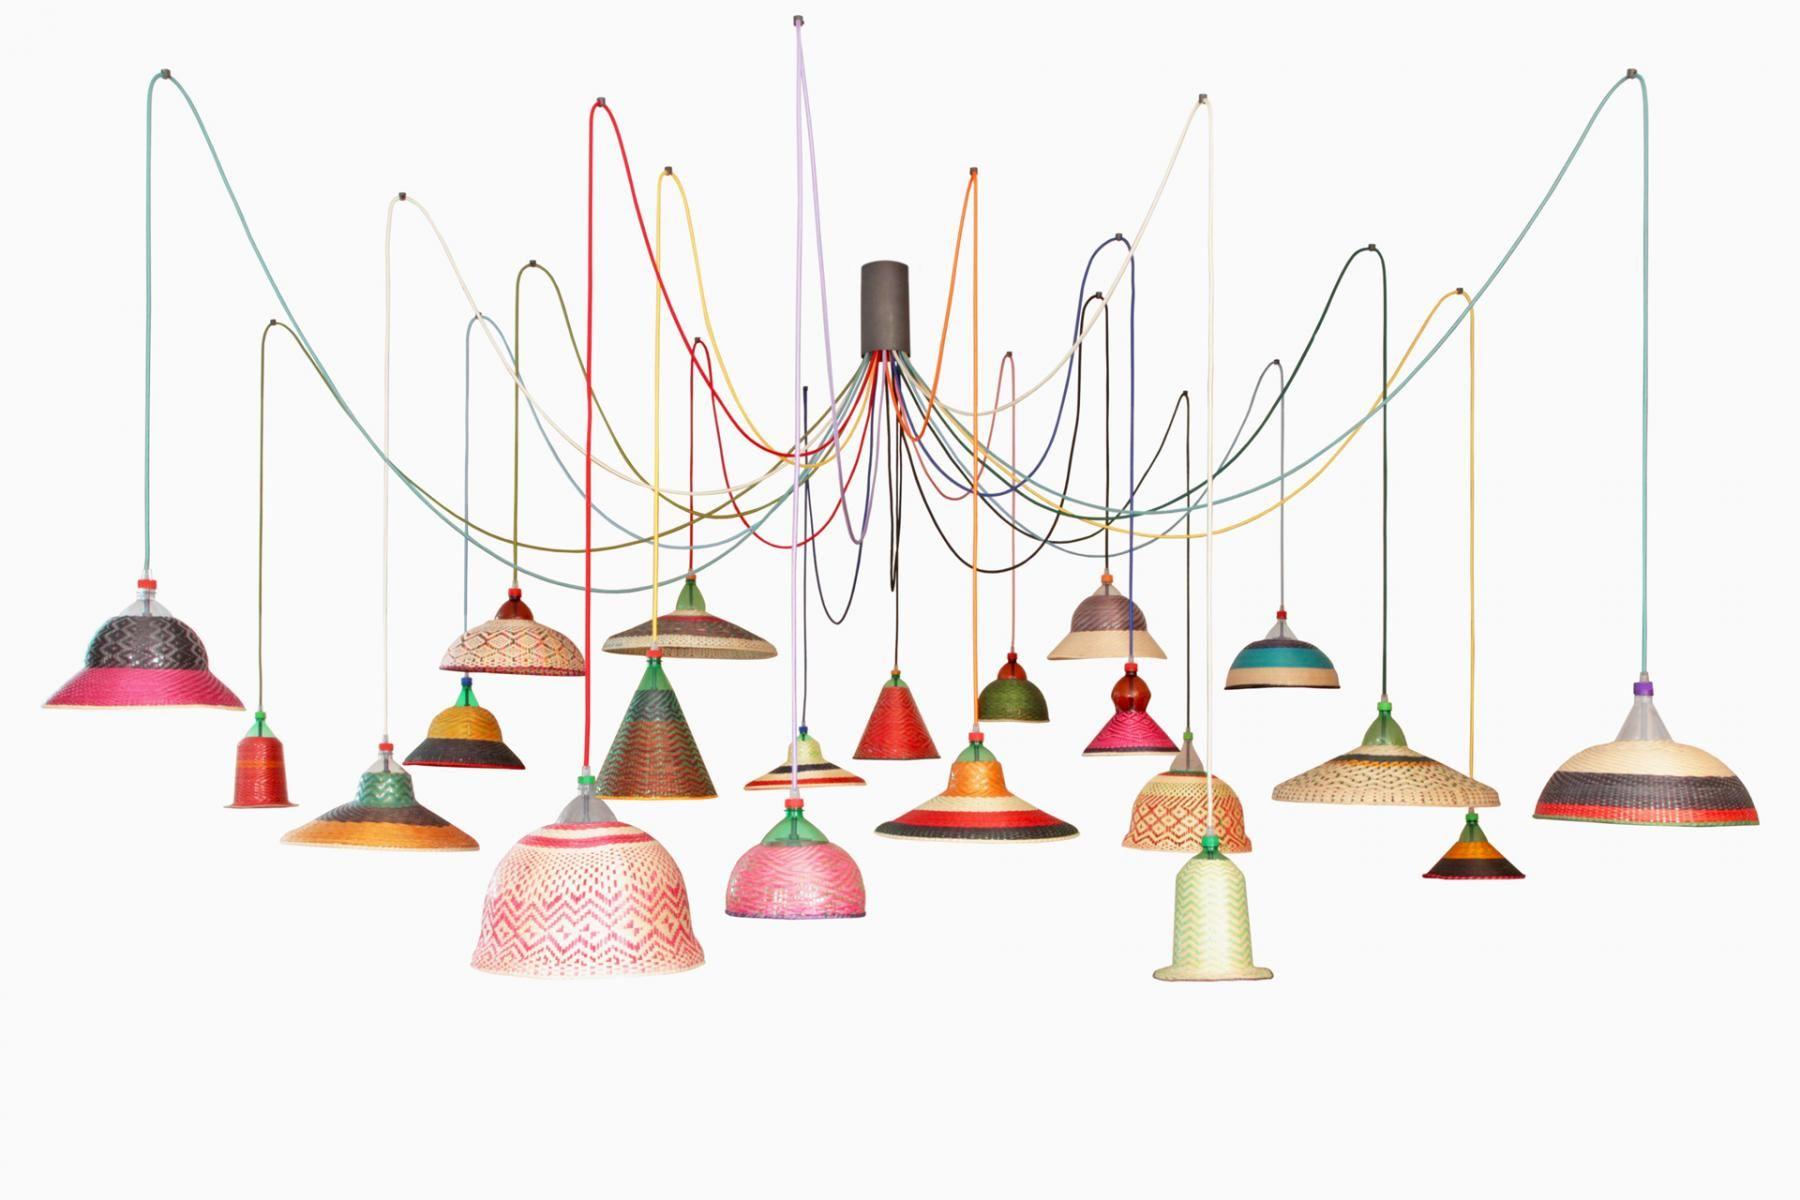 Lustre PET Lamp par Alvaro Catalán de Ocón | Lighting, Lamp